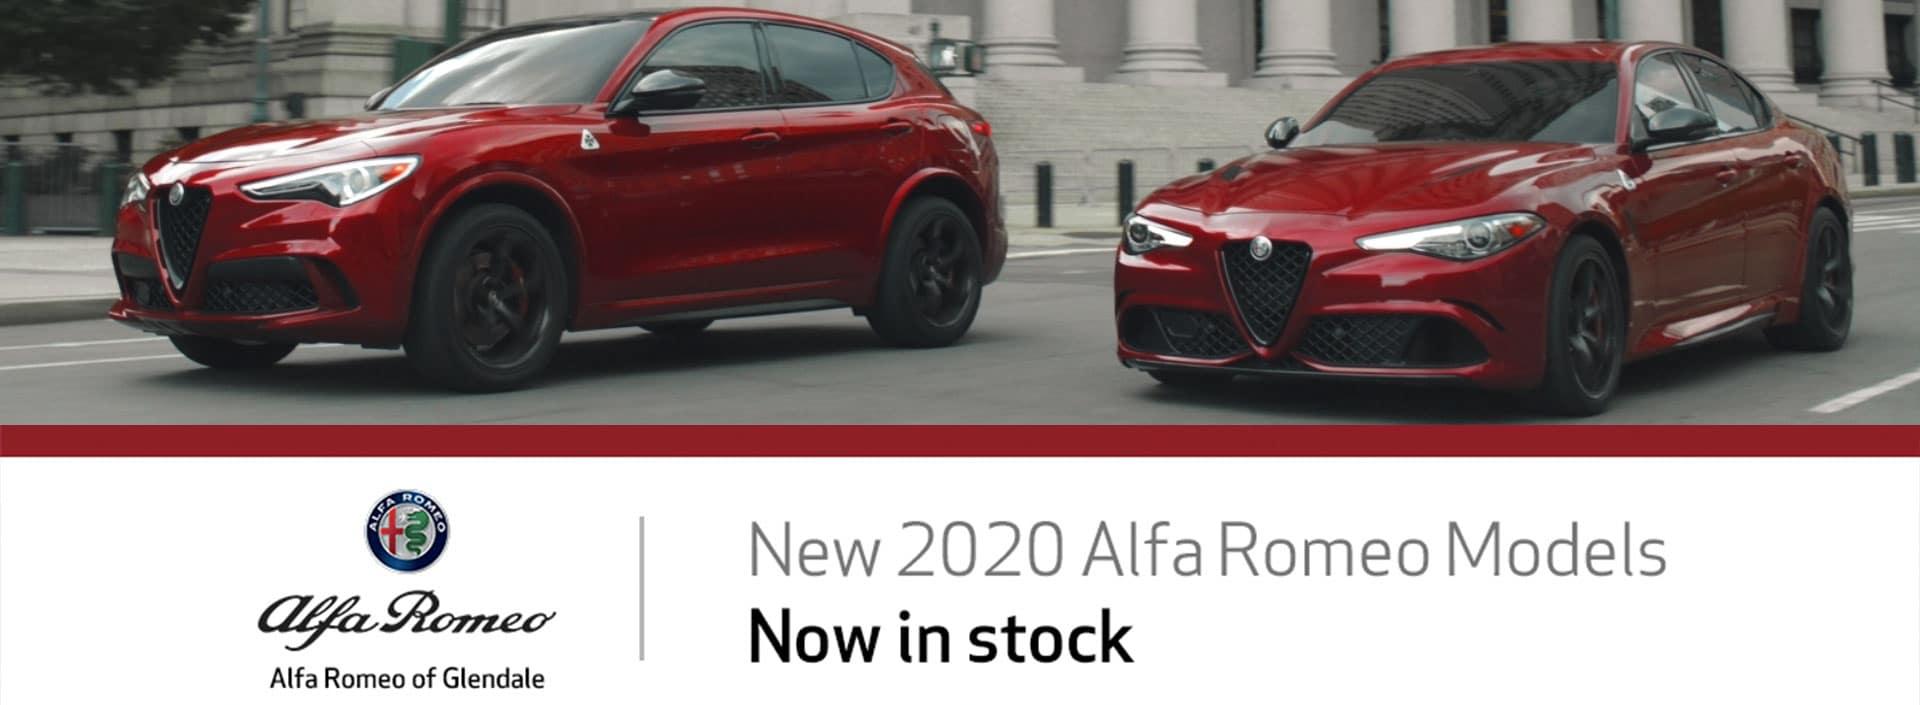 2020 Alfa Romeo Now in Stock